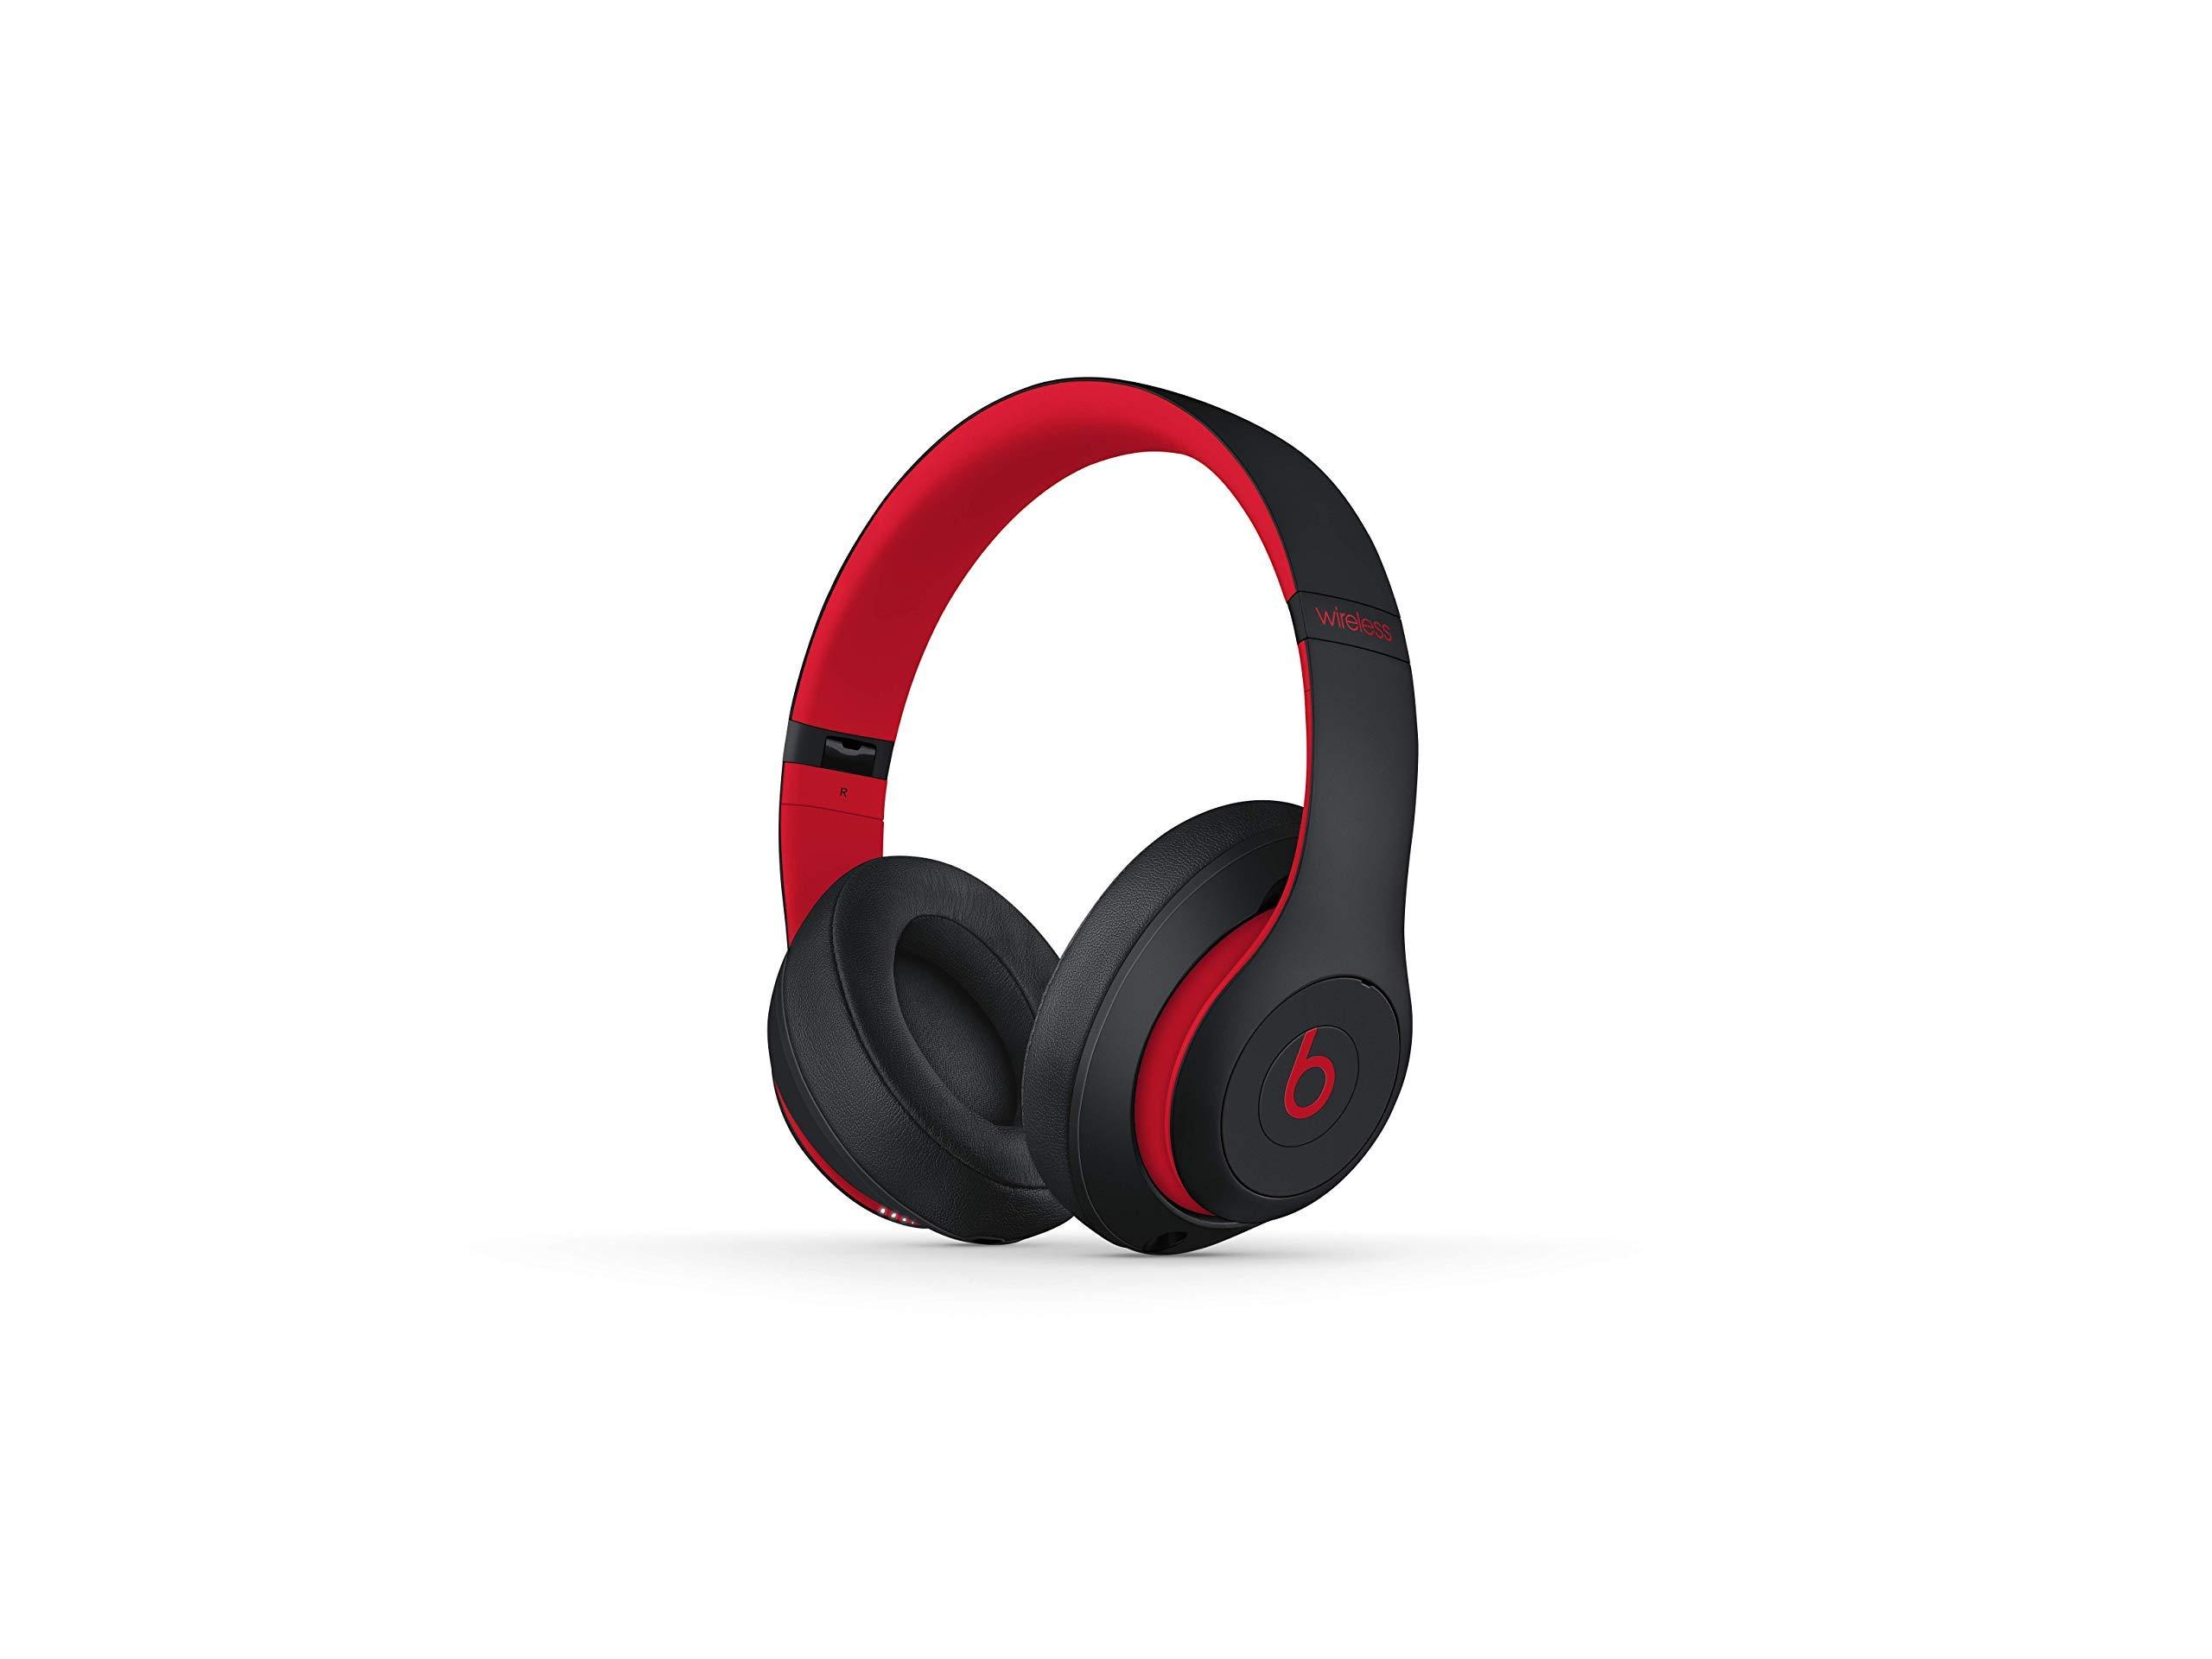 Beats Studio3 Wireless Headphones - Decade Collection, Defiant Black-Red (Renewed) by Beats